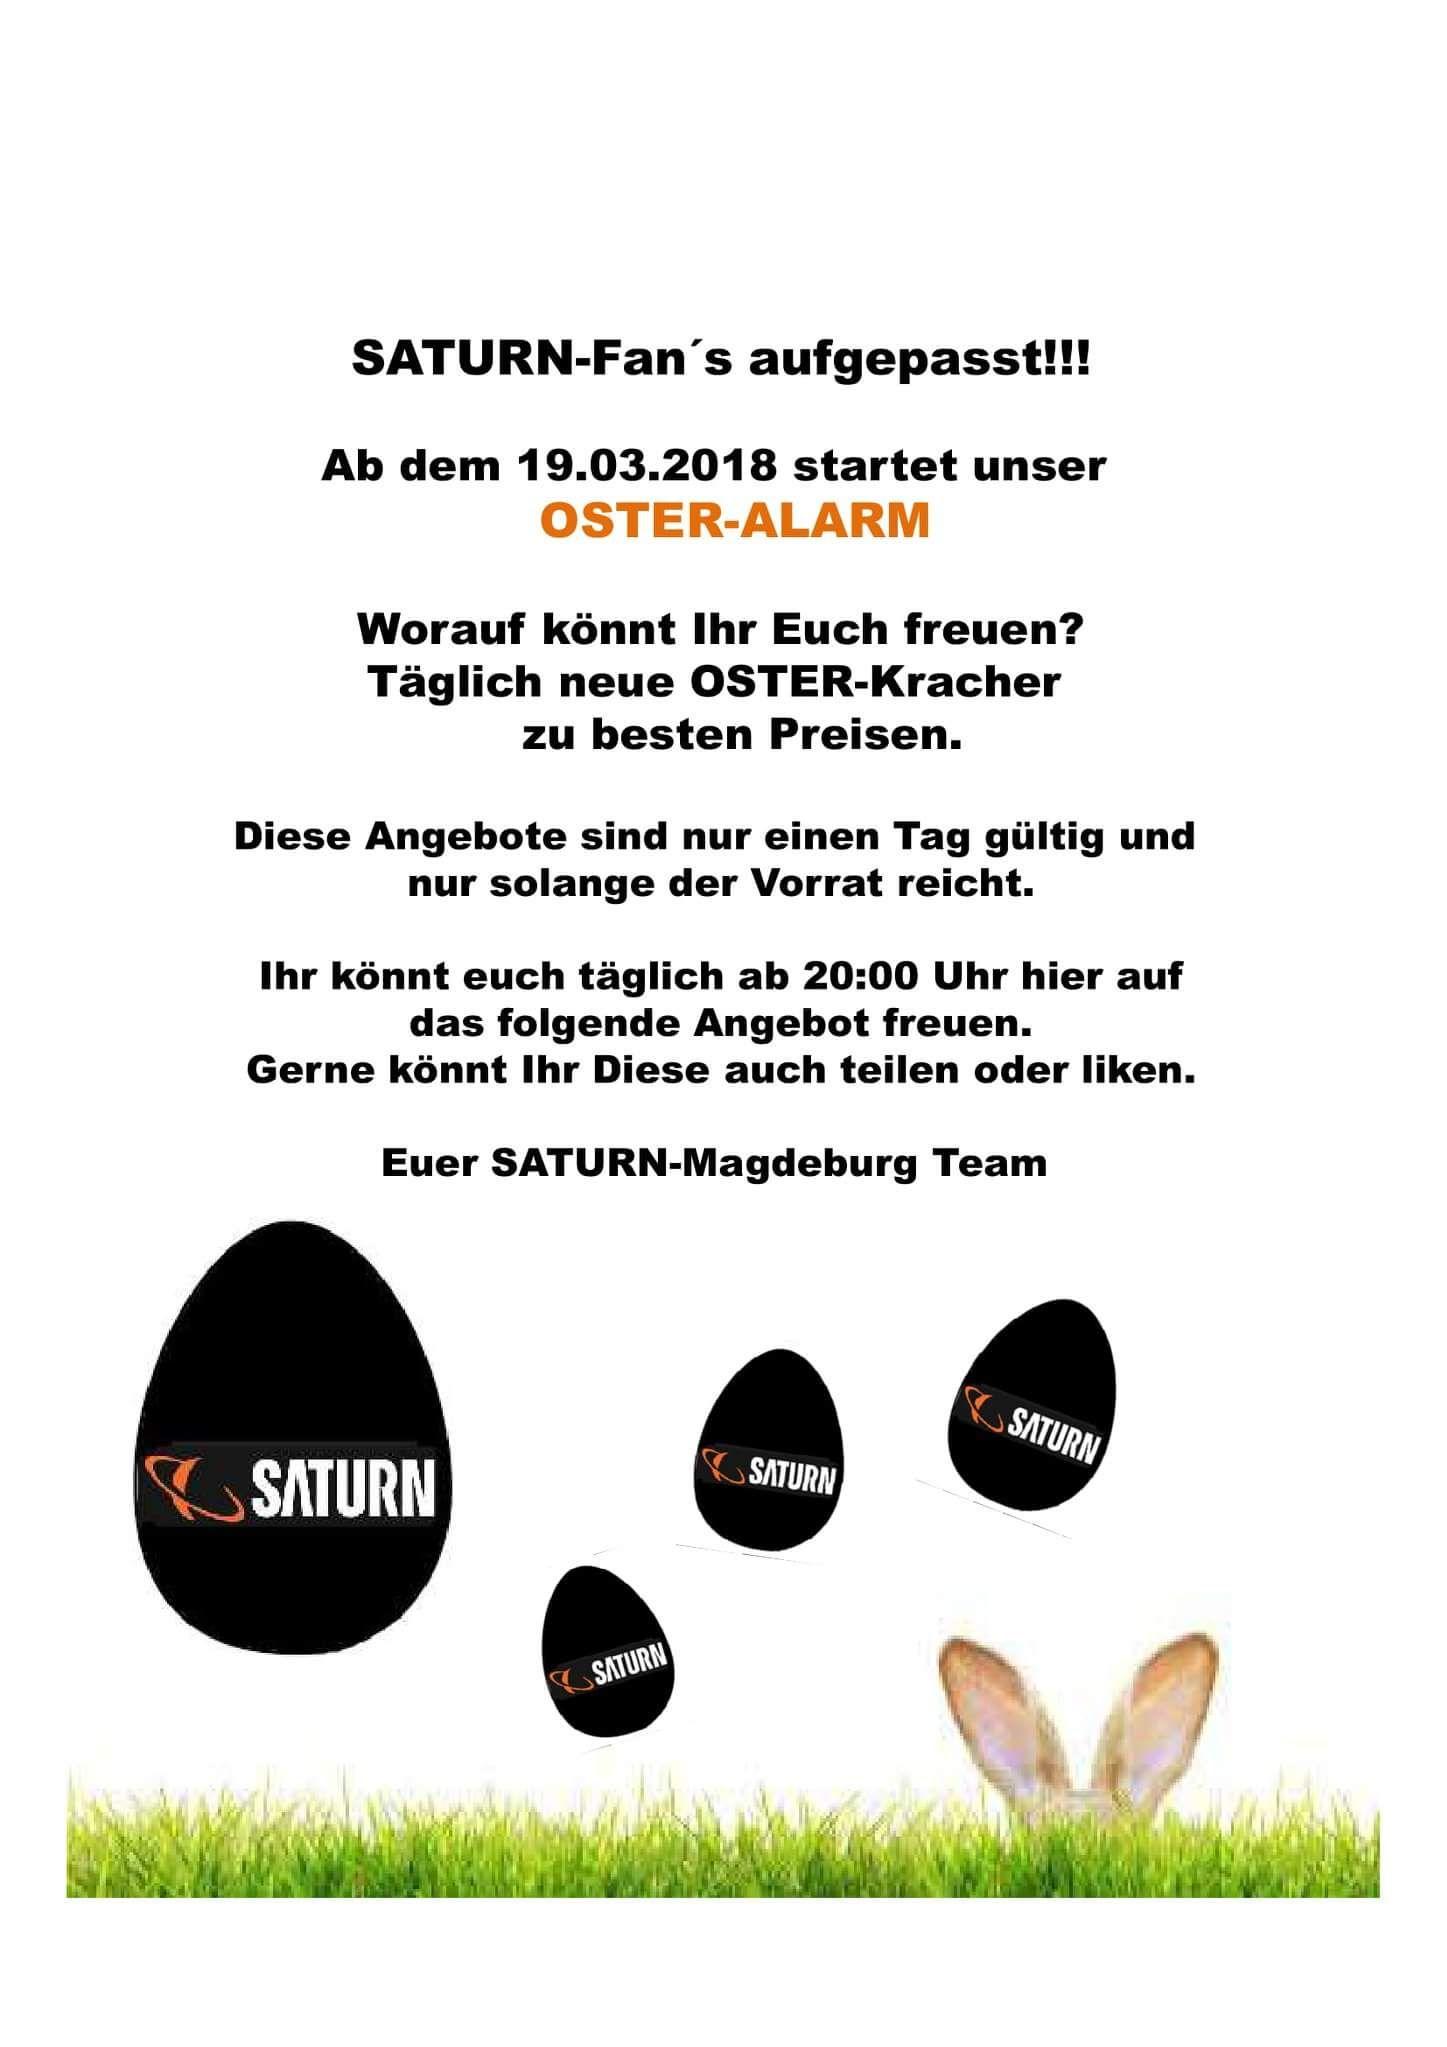 [Lokal] Saturn Magdeburg verschiedene Oster Angebote